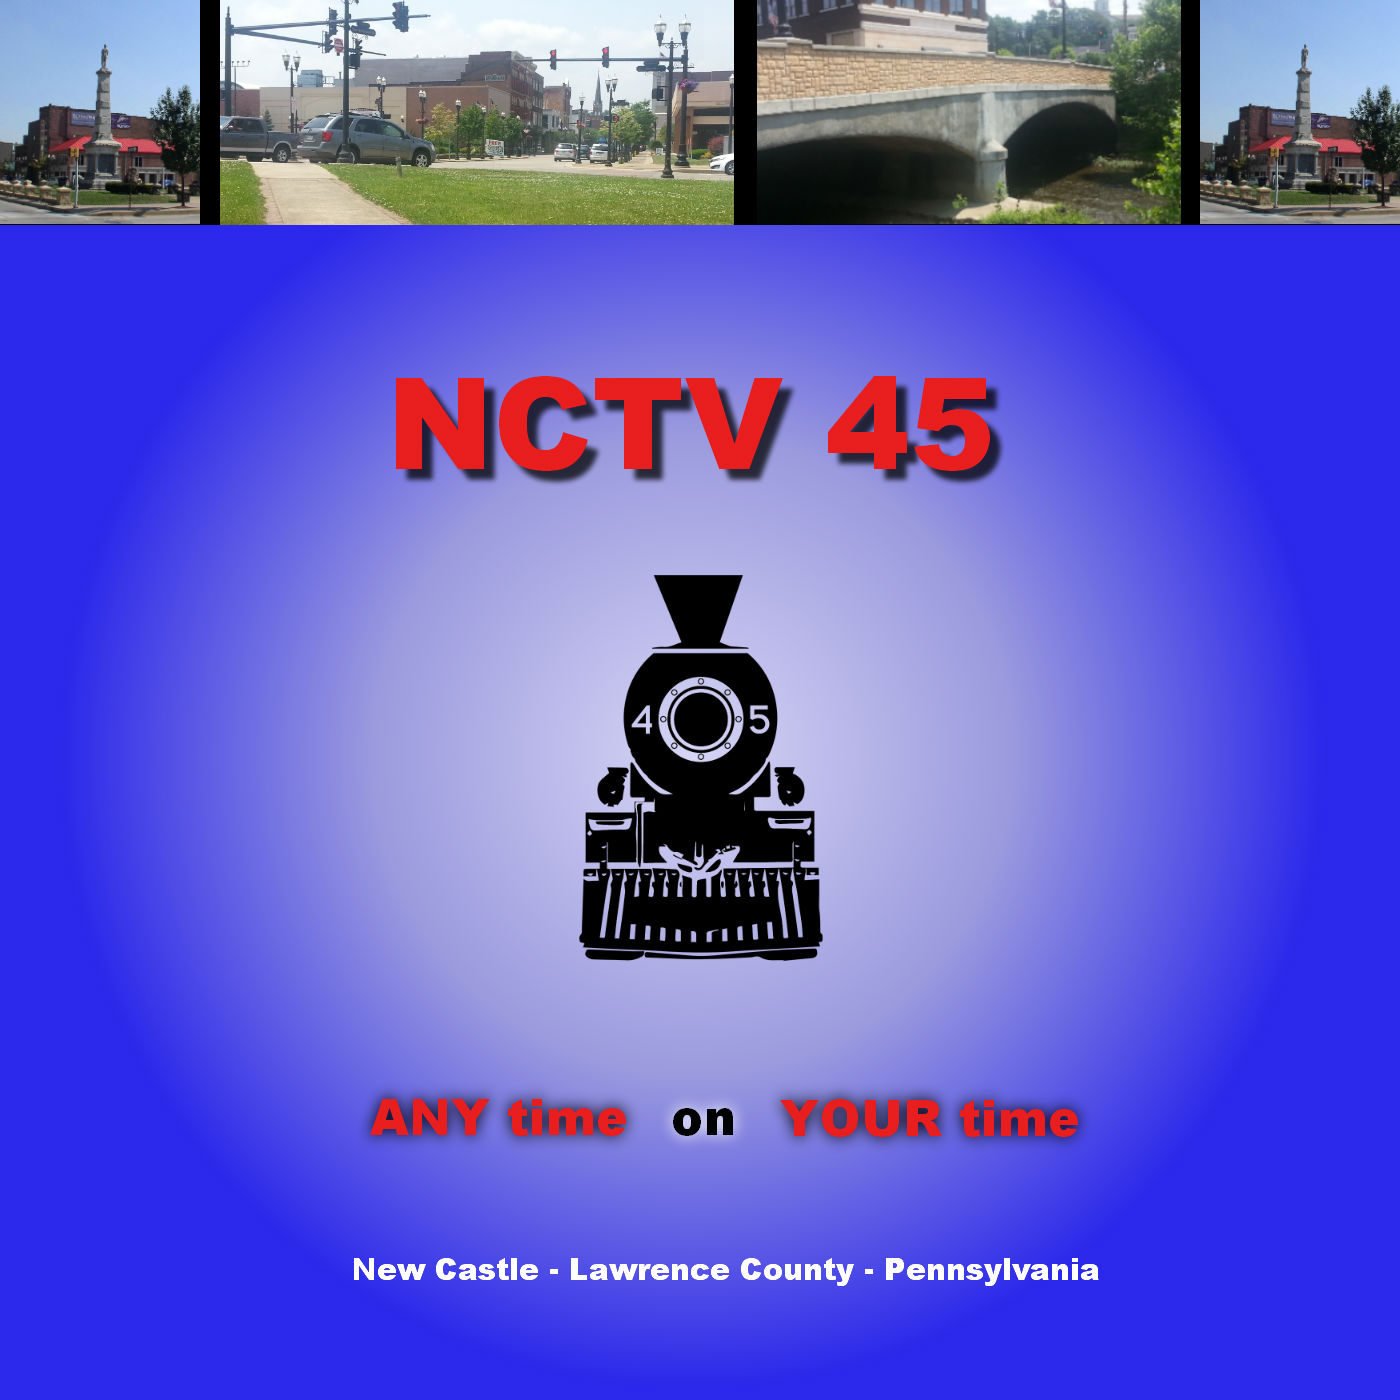 Artwork for NCTV45's Lawrence County Community Happenings January 27 Thru Feb 2 2019